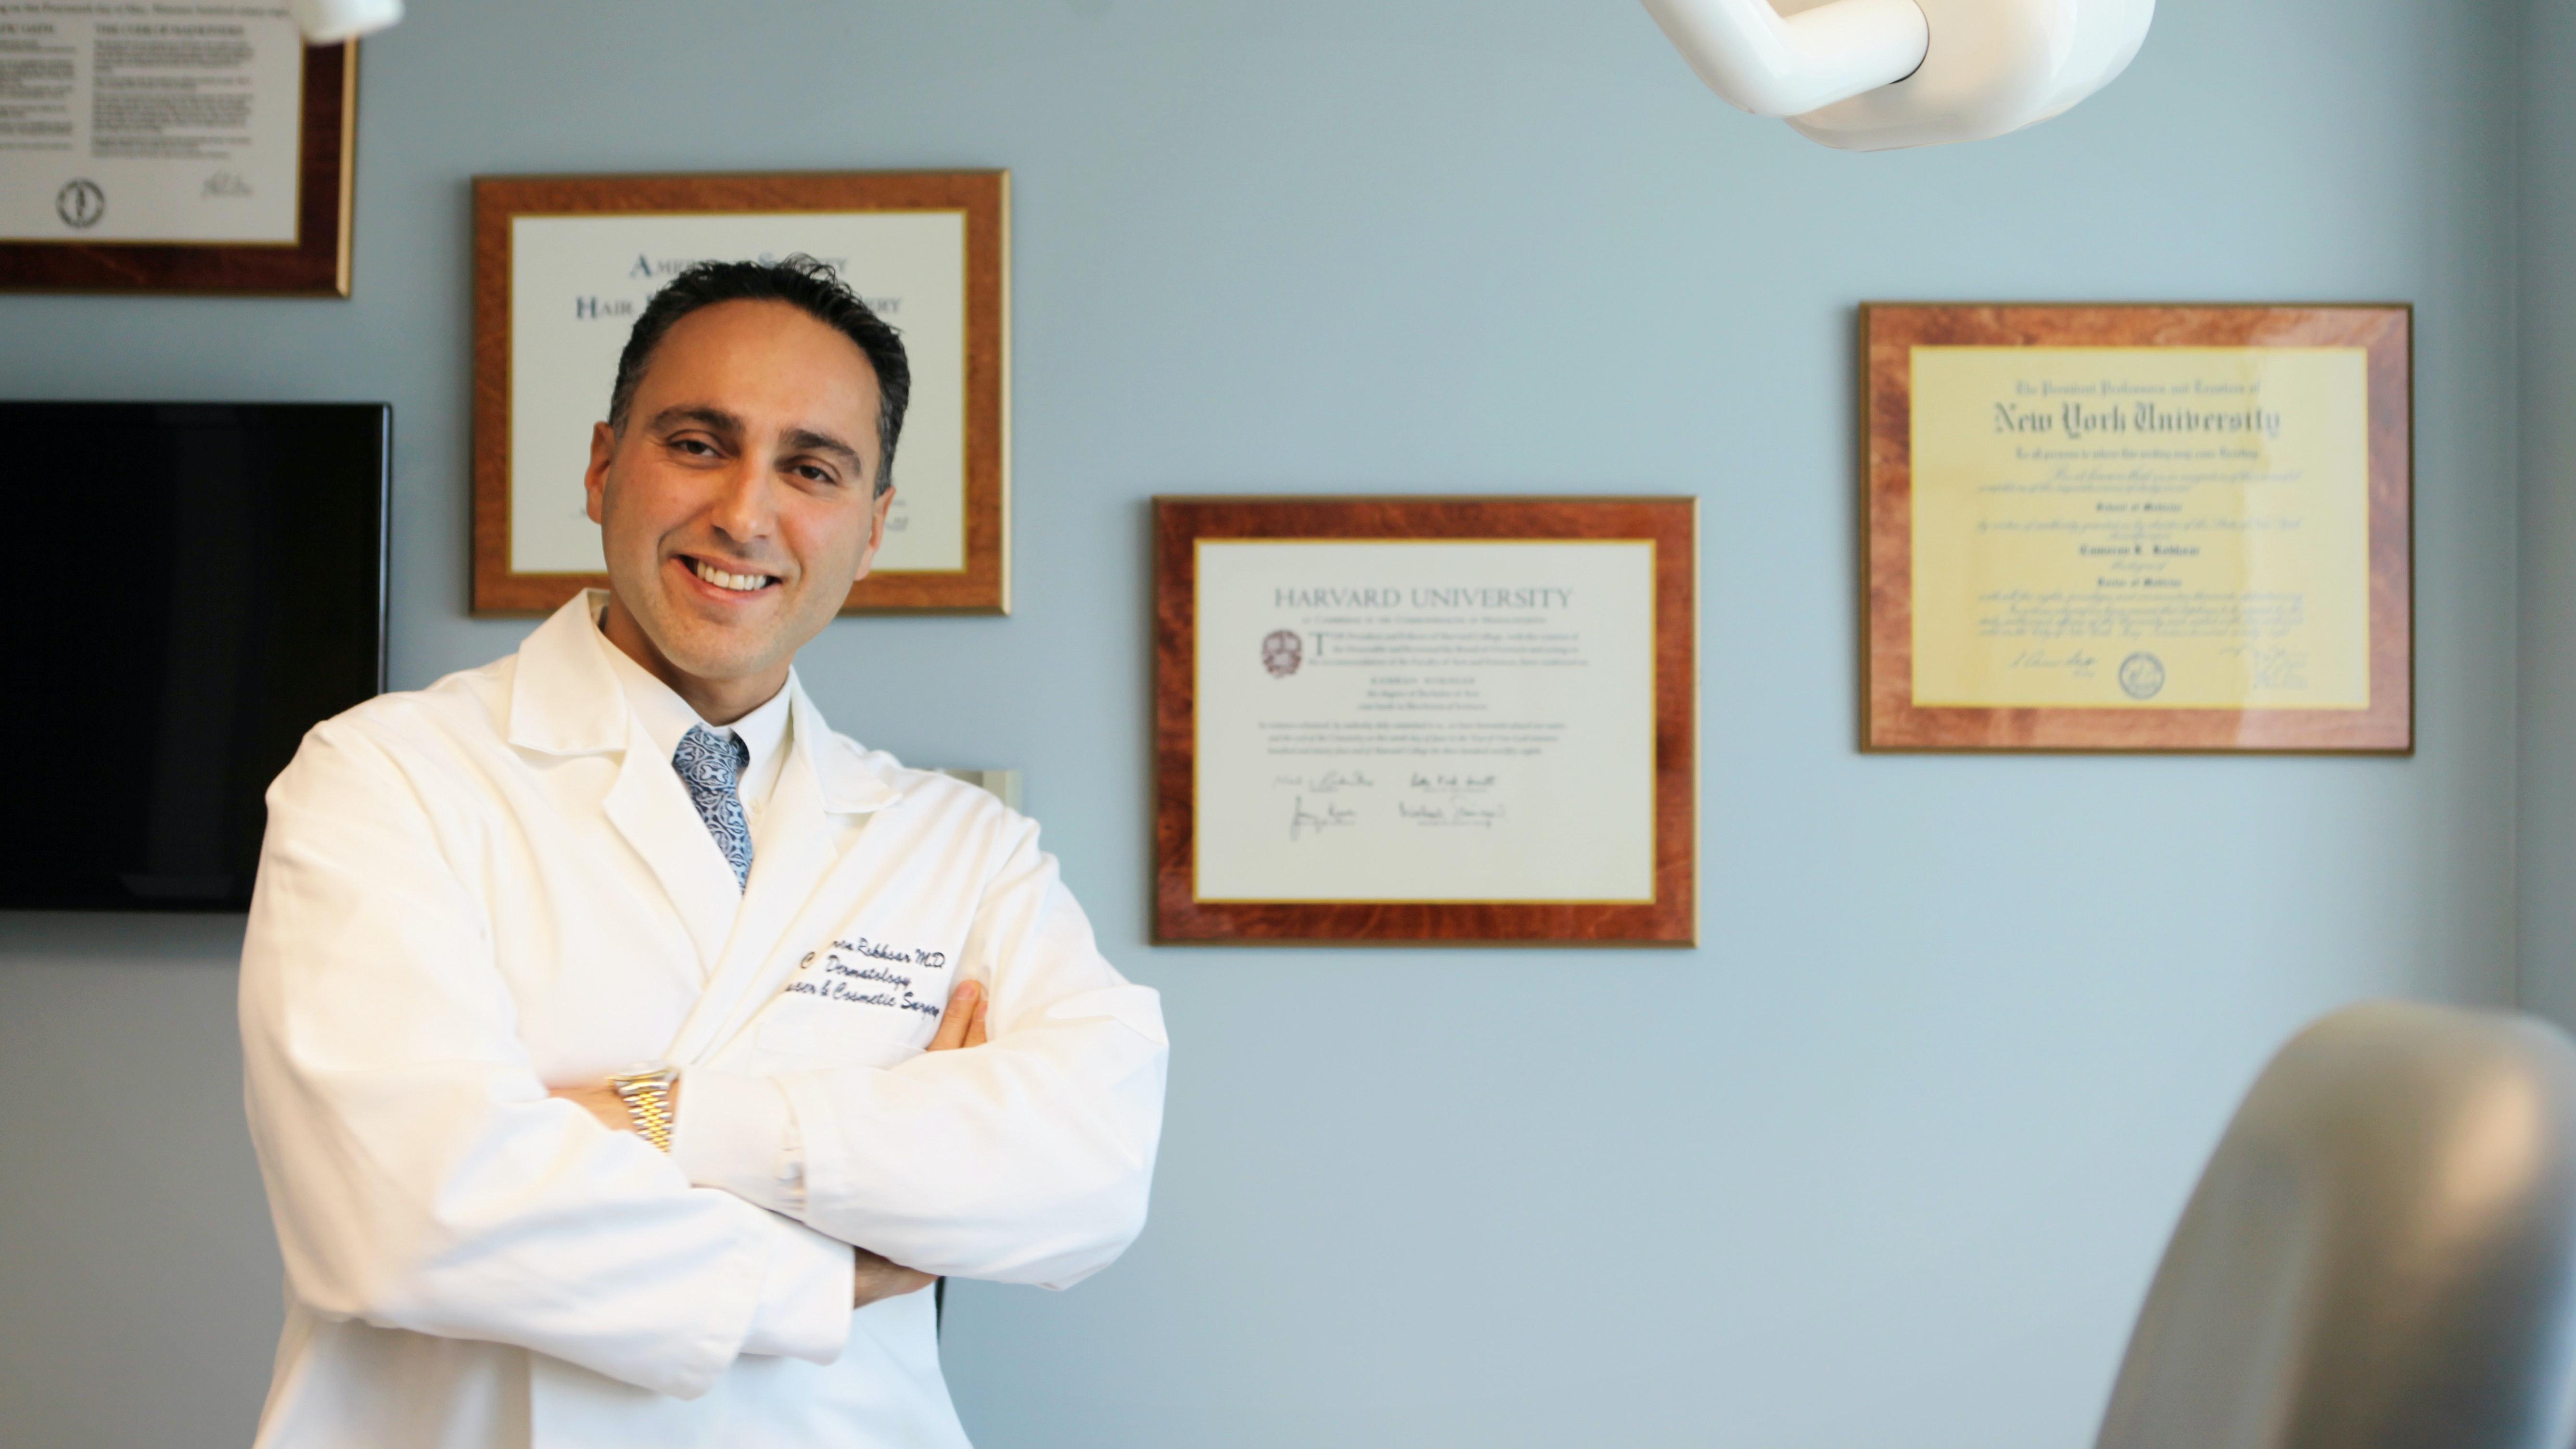 Dr. Cameron Rokhsar